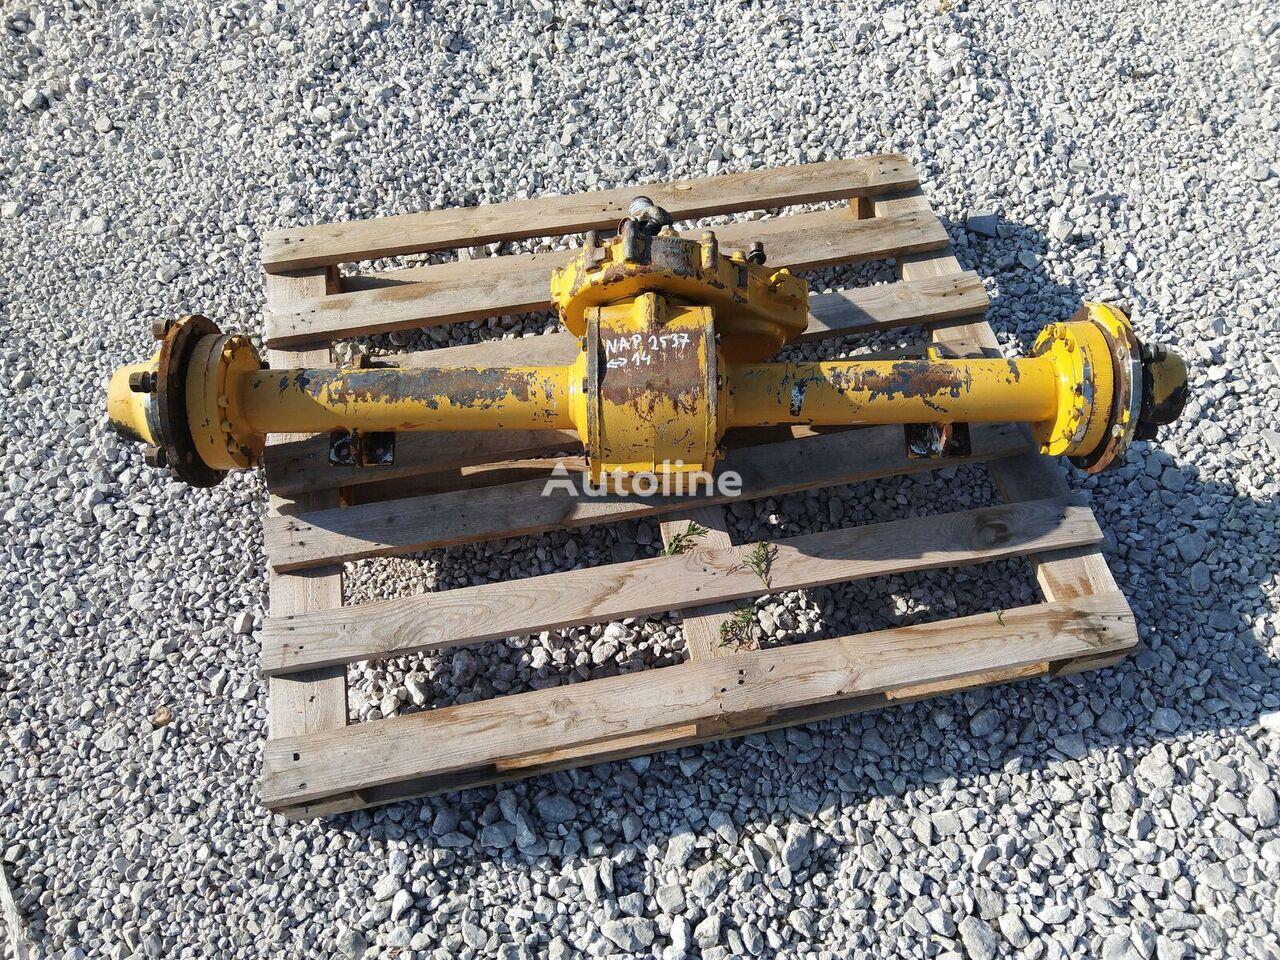 Comer [P-13 S-3×20 W-57] ze skrzynią Wozidełko 125cm Axle achse drive axle for wheel loader